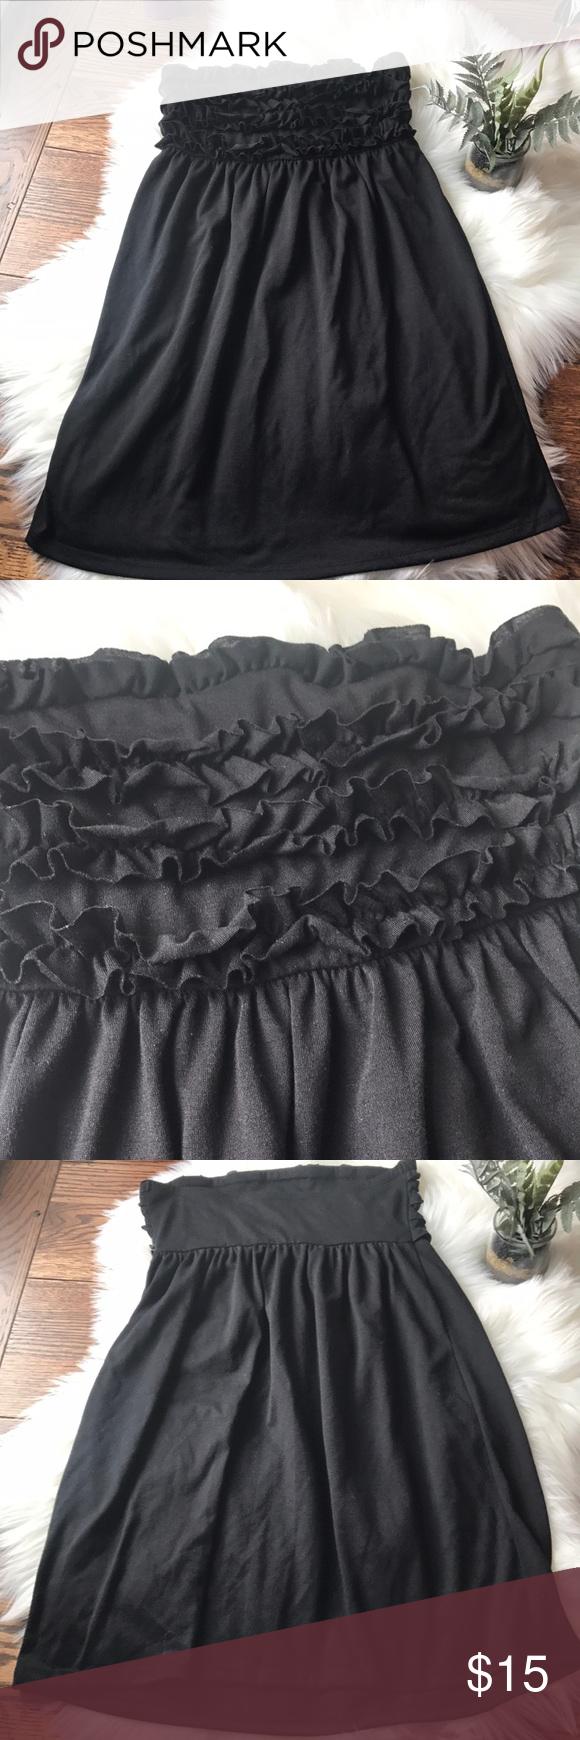 f86ac85f3d OP BLACK STRAPLESS RUFFLED TOP SWIMSUIT COVERUP-M This OP black strapless  ruffled top swimsuit